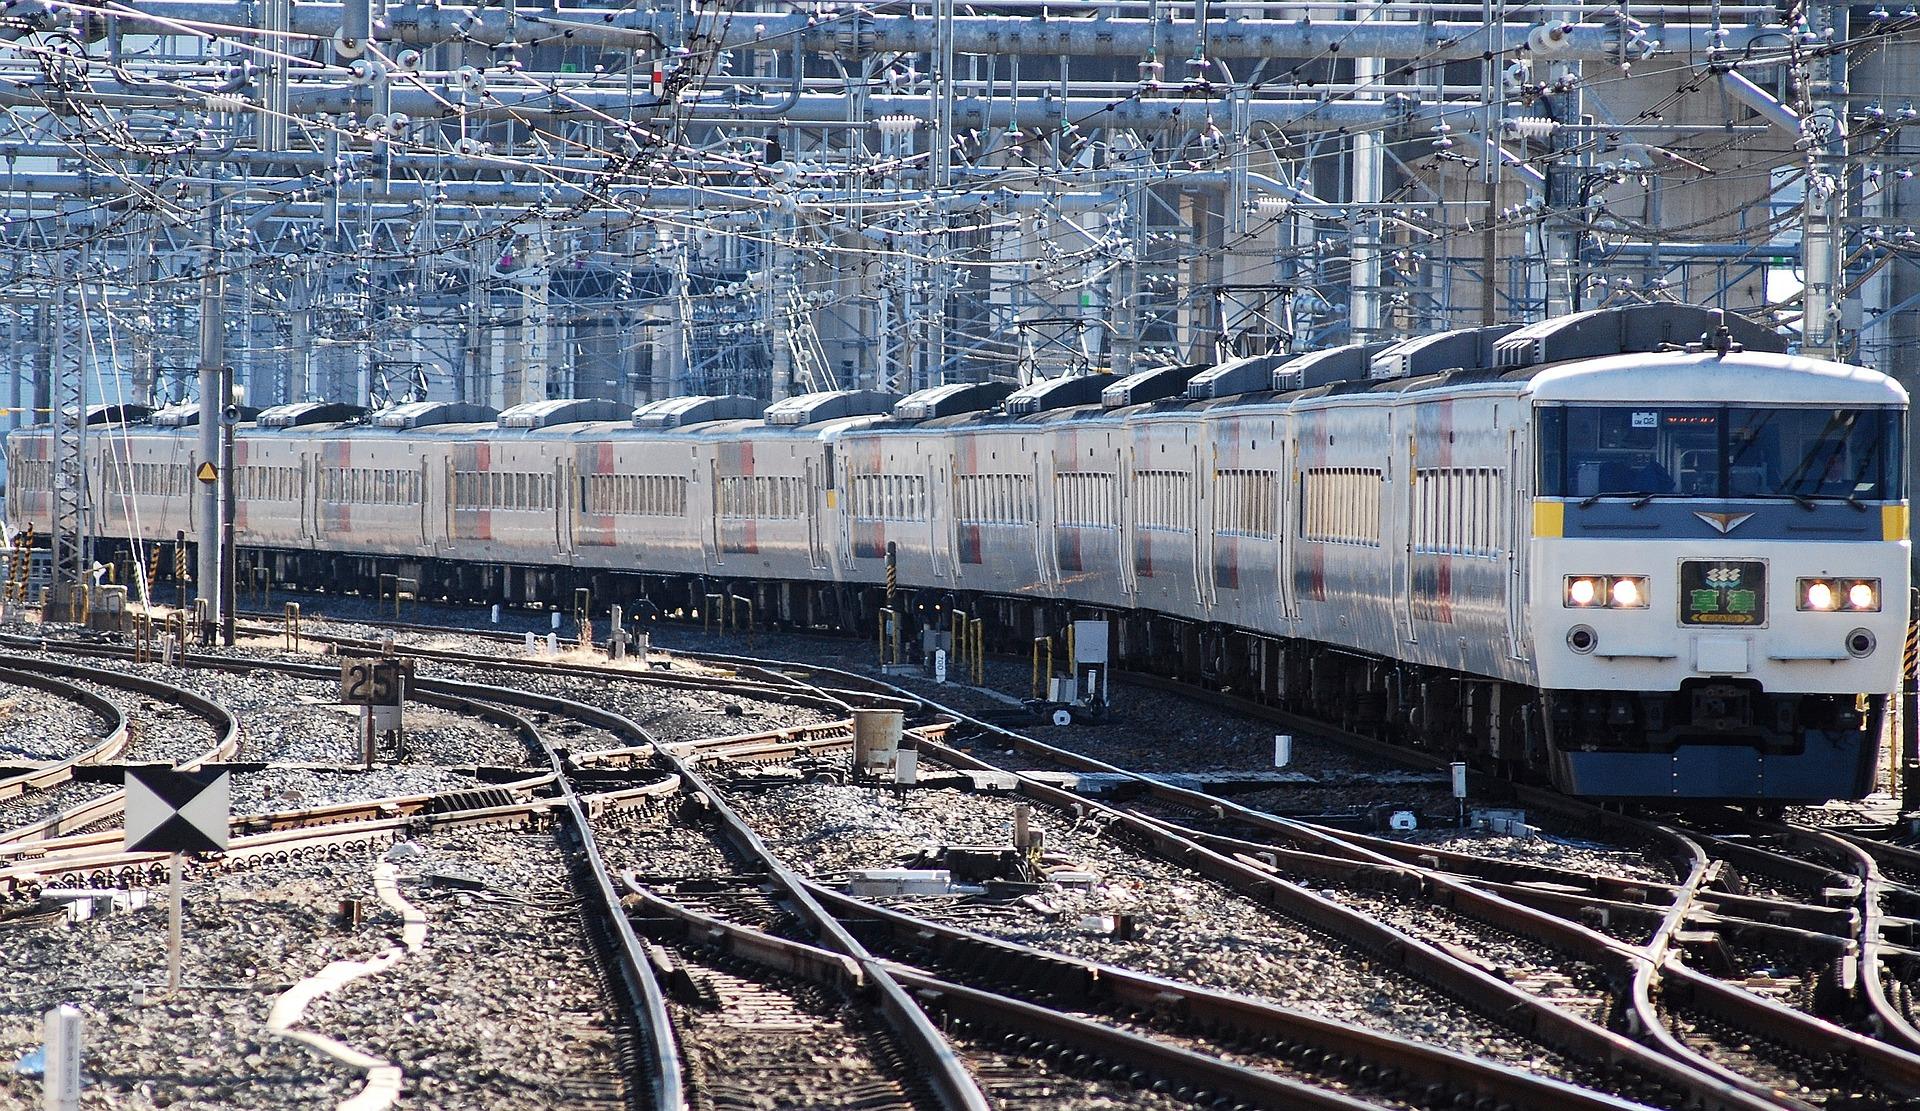 train-76723_1920